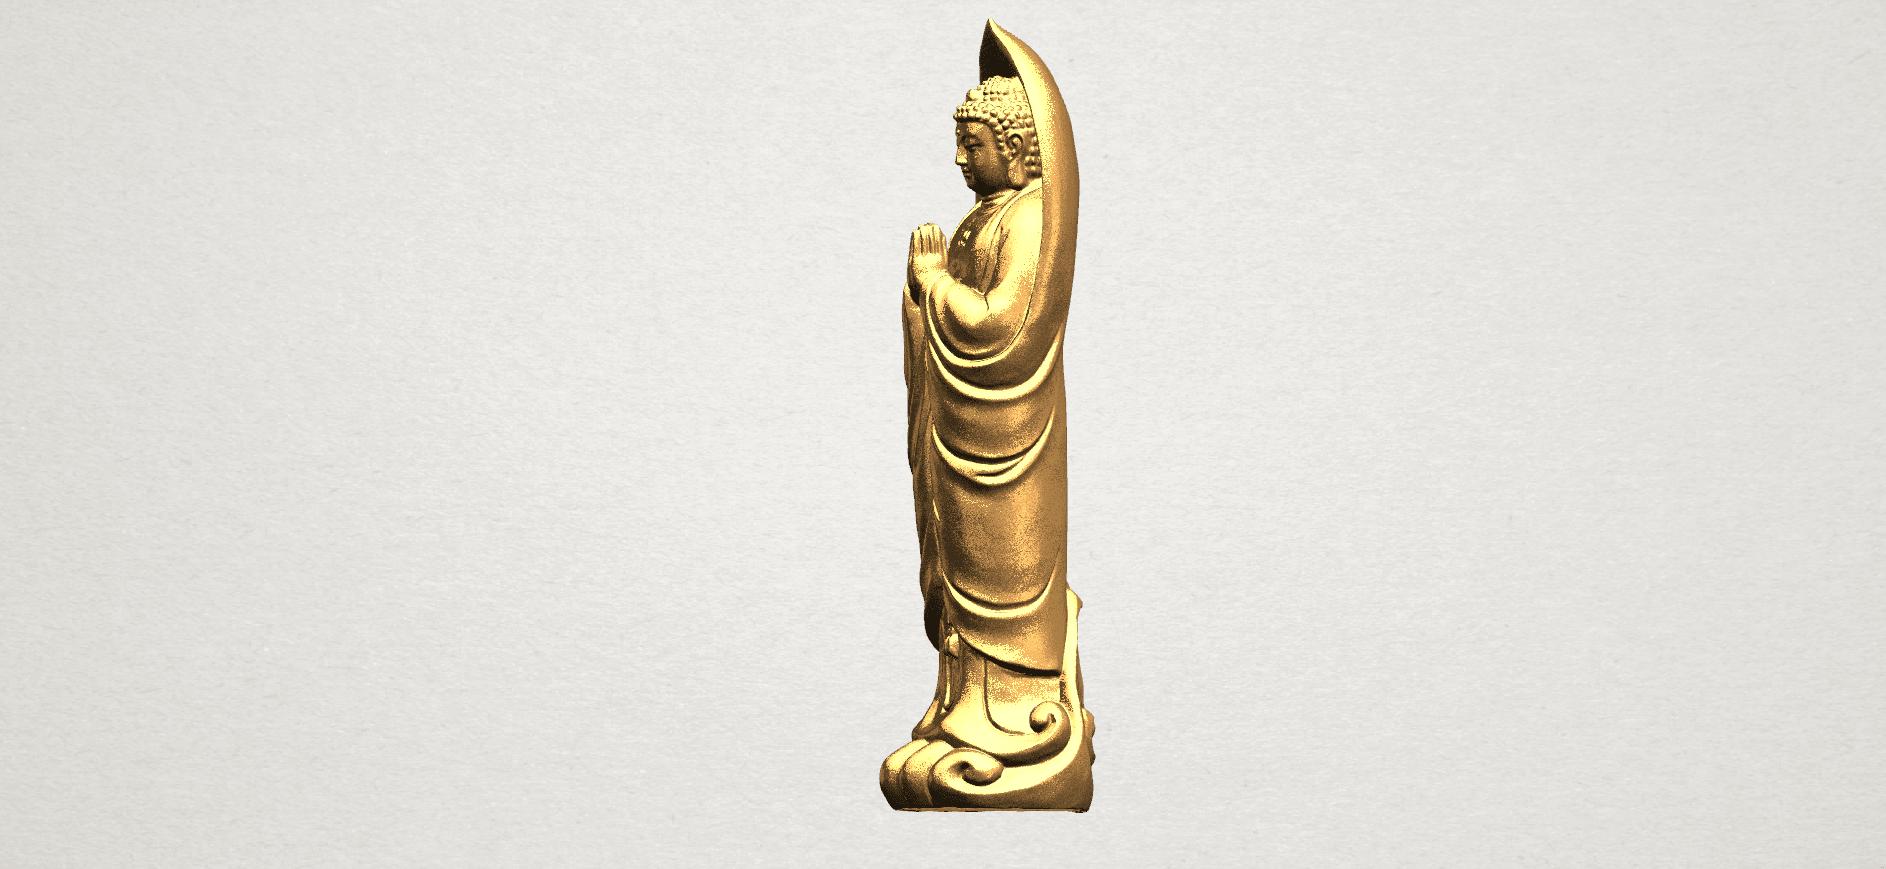 Gautama Buddha Standing (iv) A03.png Download free STL file Gautama Buddha Standing 04 • 3D printable design, GeorgesNikkei